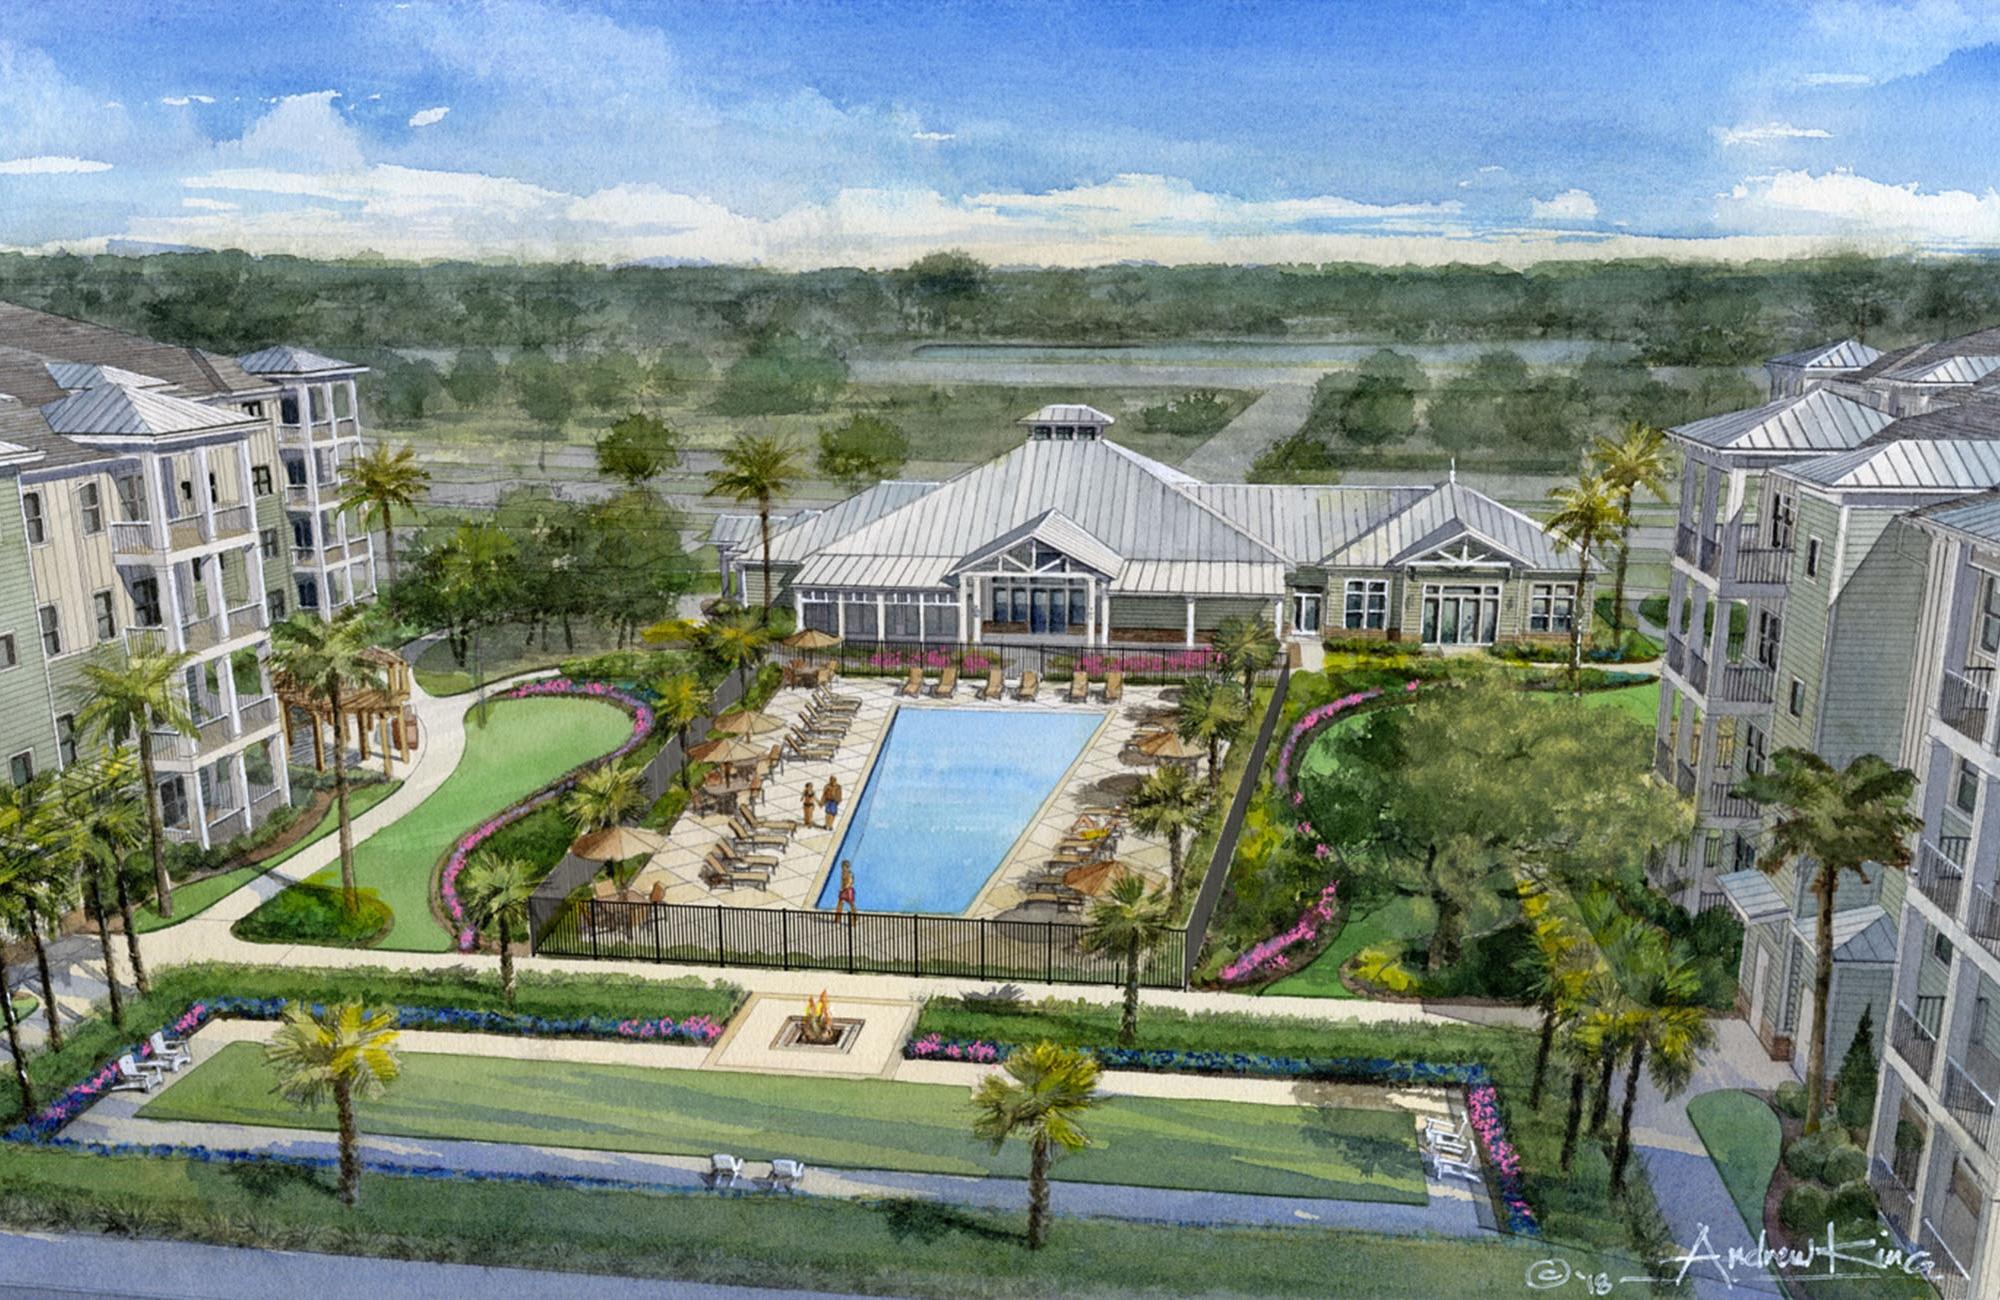 Parc at Wesley Chapel - Pascoa County, Florida